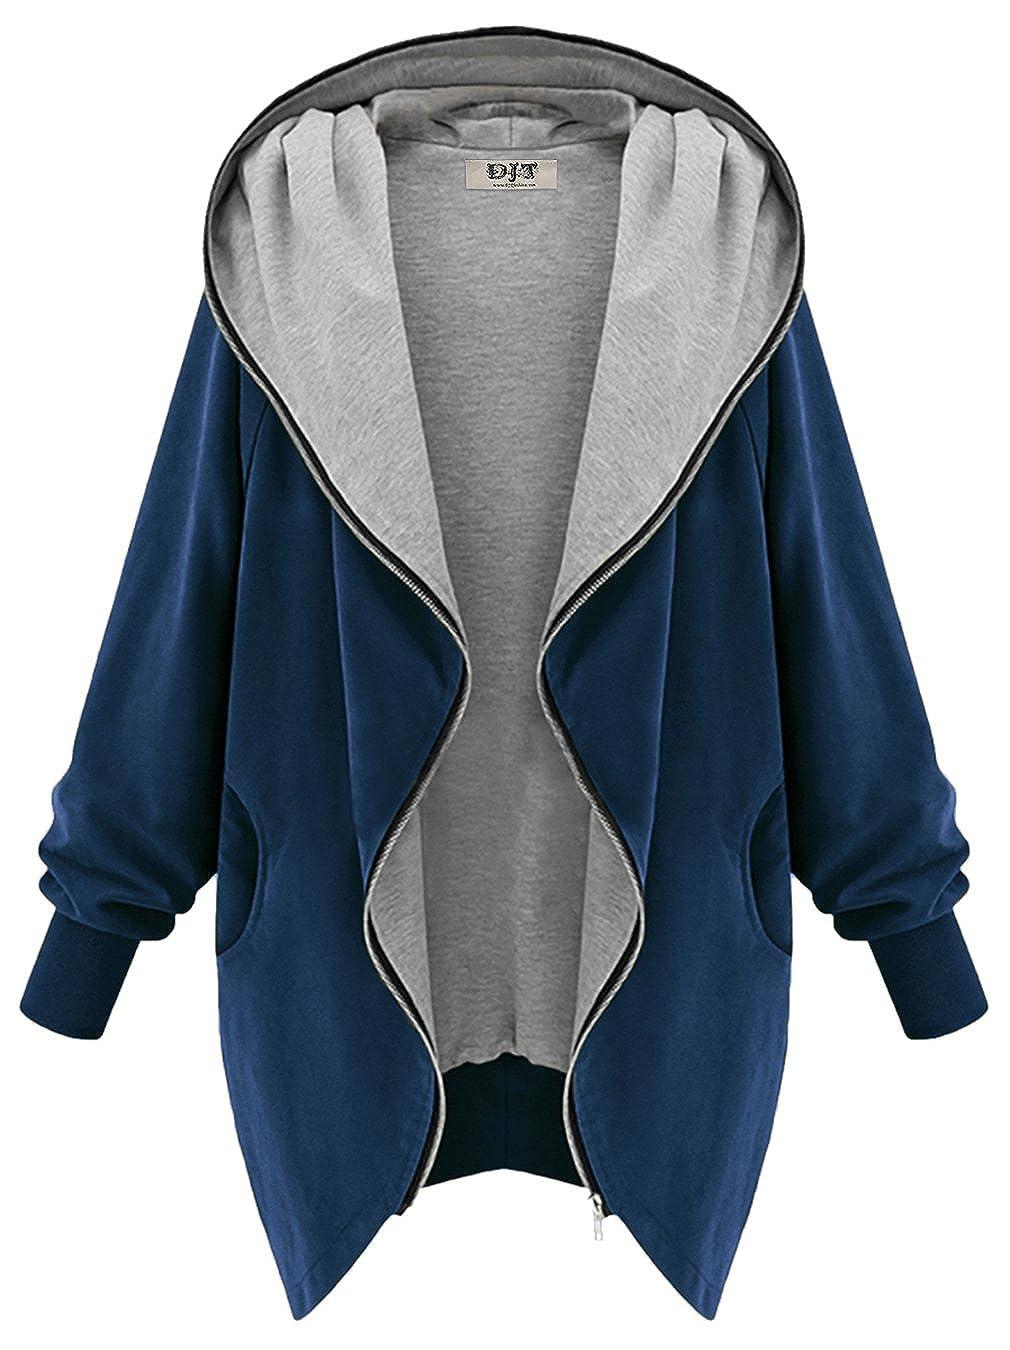 DJT Women's Ladies Zip Up Long Hooded Loose Parka Cardigan Top Jacket Coat D146C05BLE02